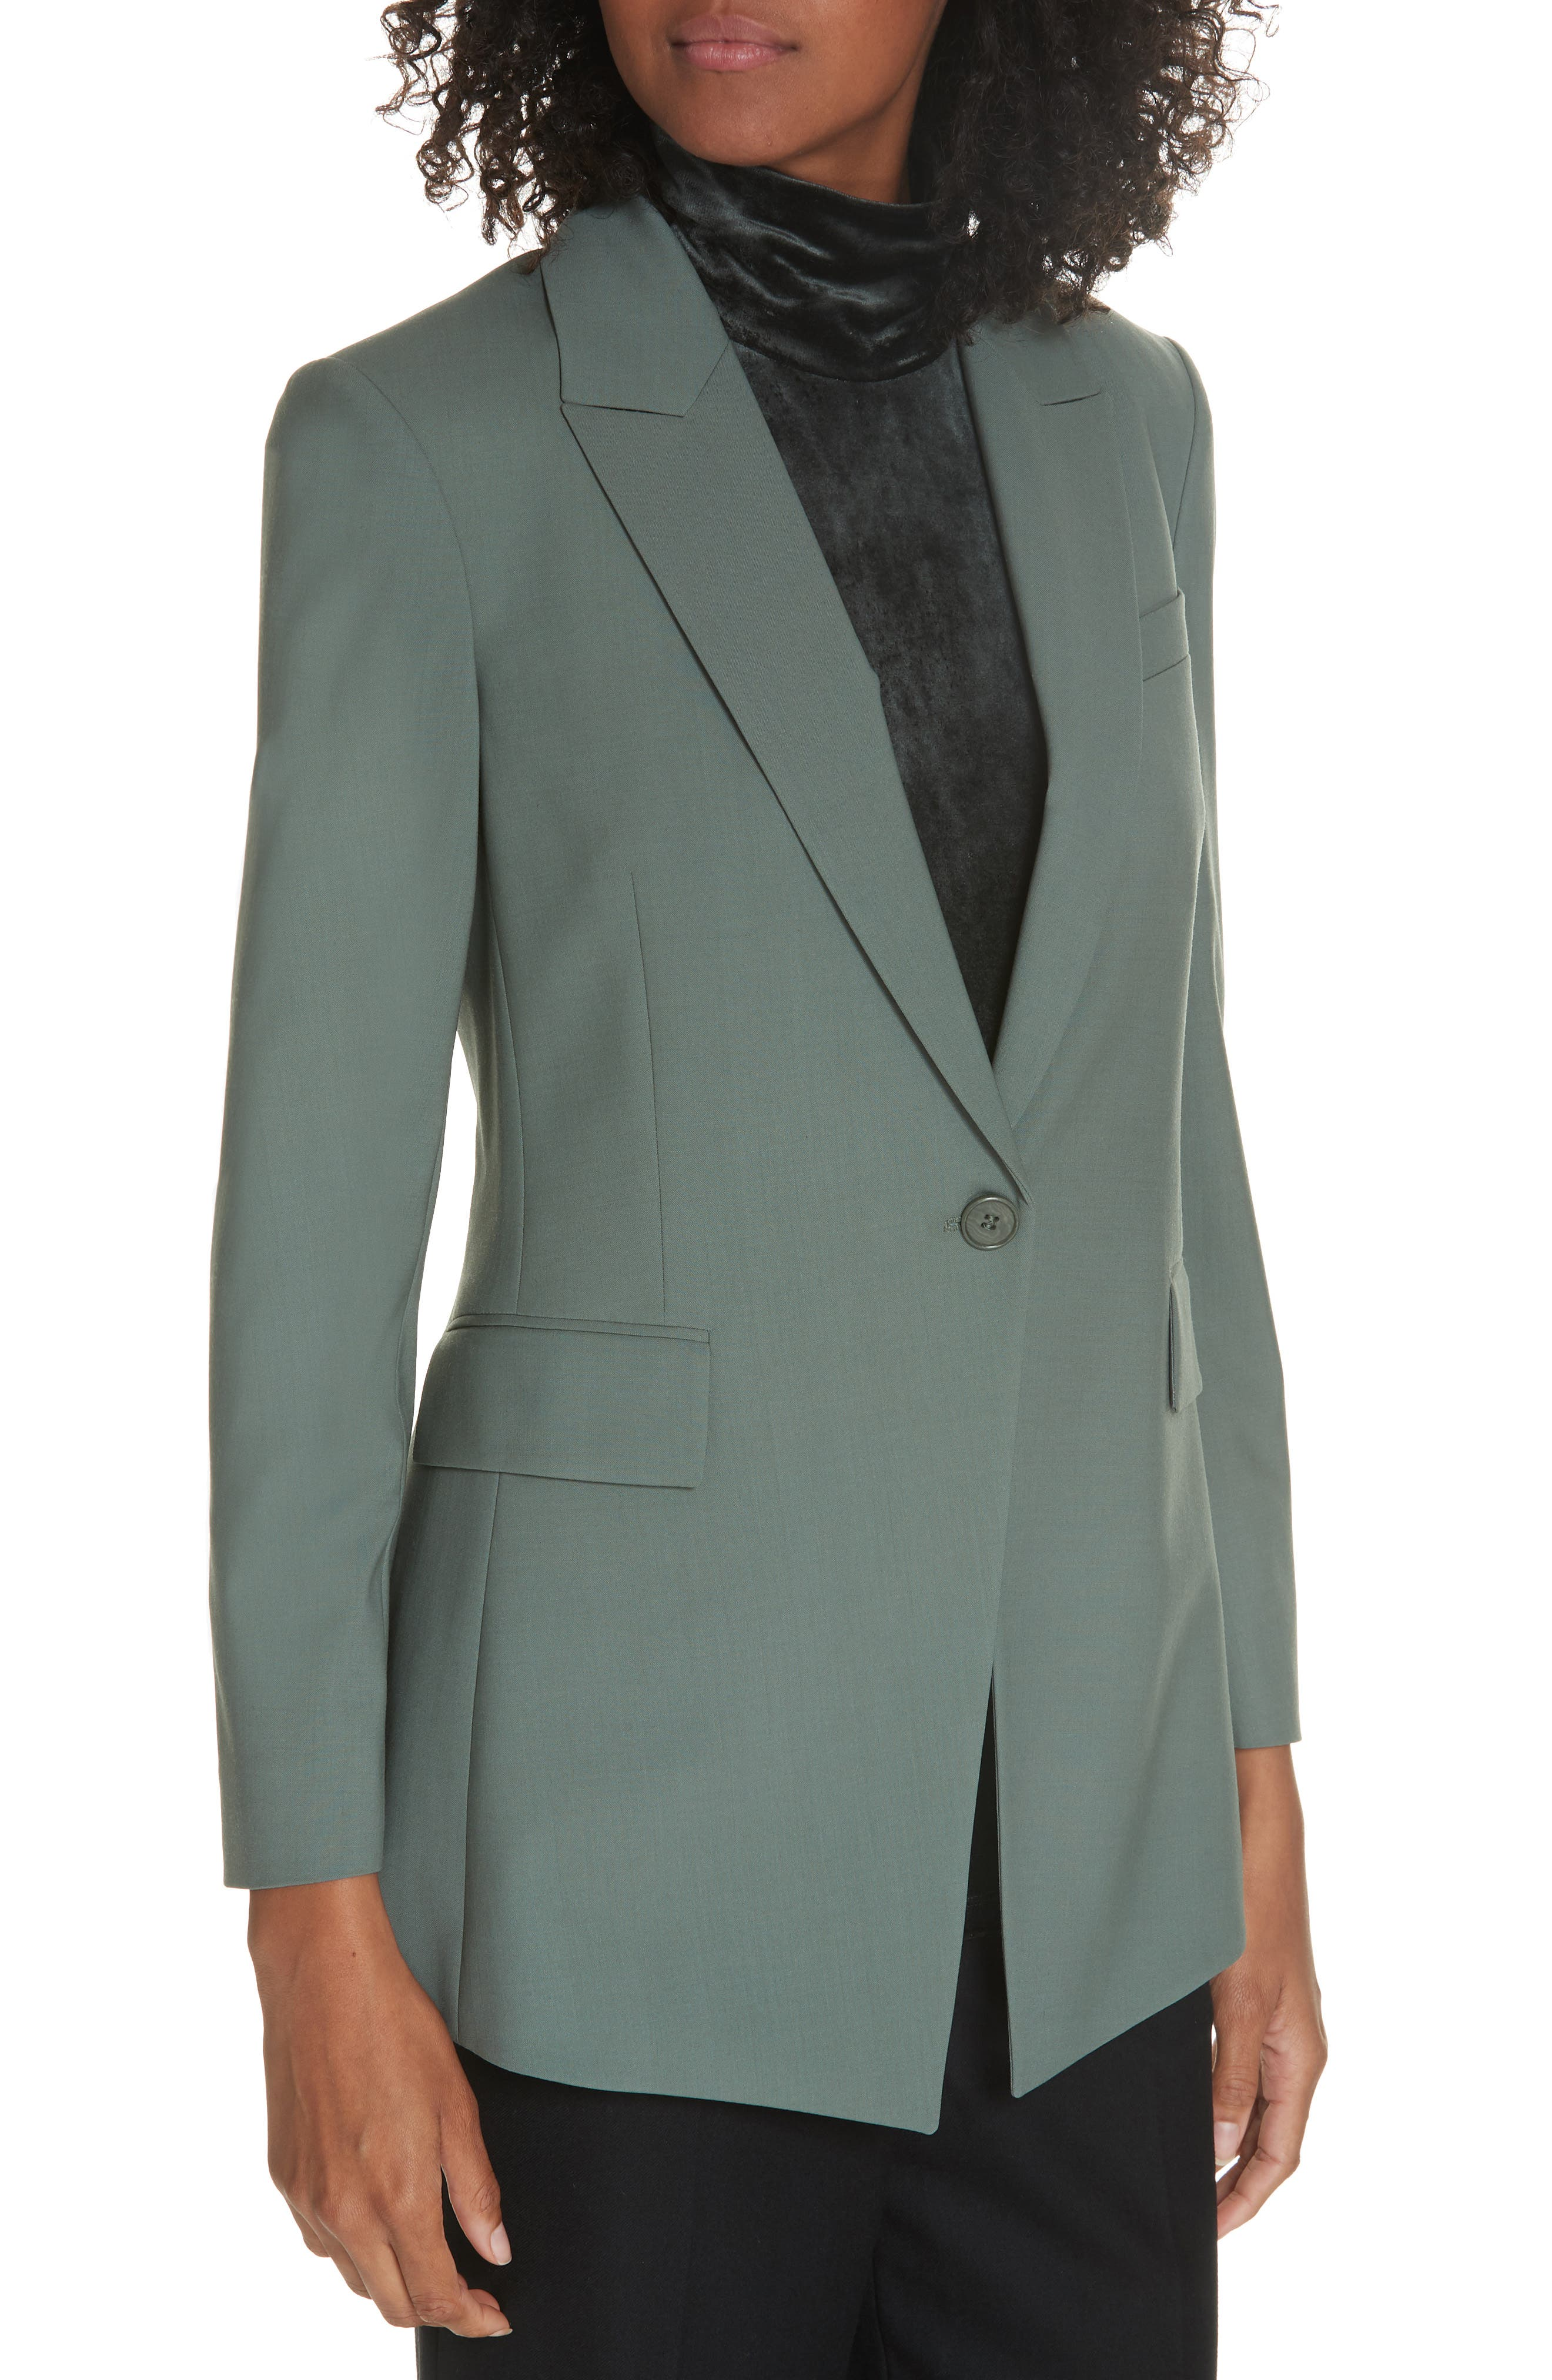 Etienette B Good Wool Suit Jacket,                             Alternate thumbnail 25, color,